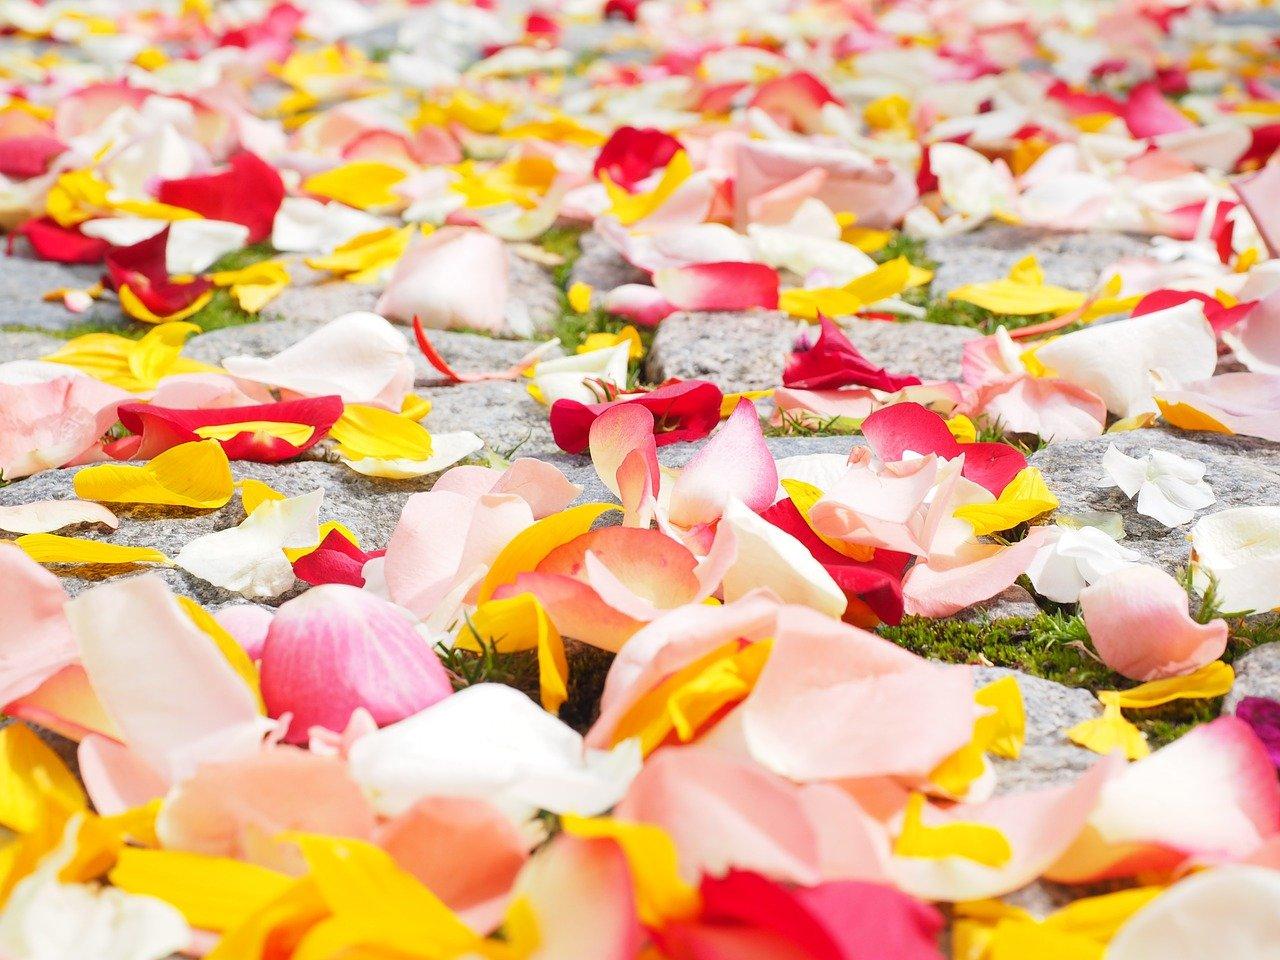 rose-petals-693570_1280.jpg